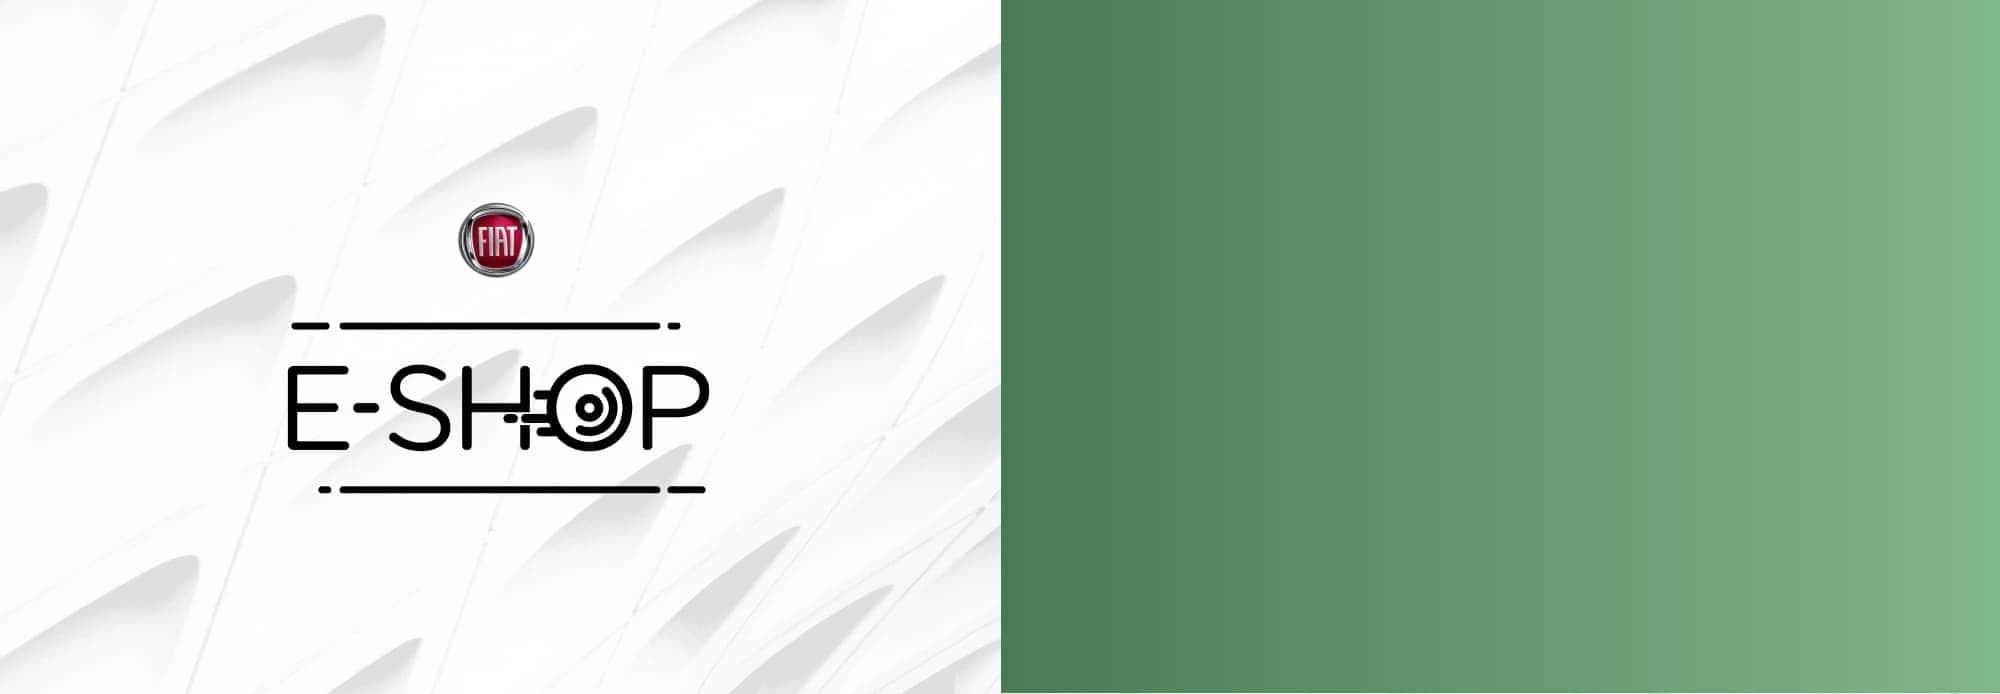 Logo deE-Shop de Fiat.